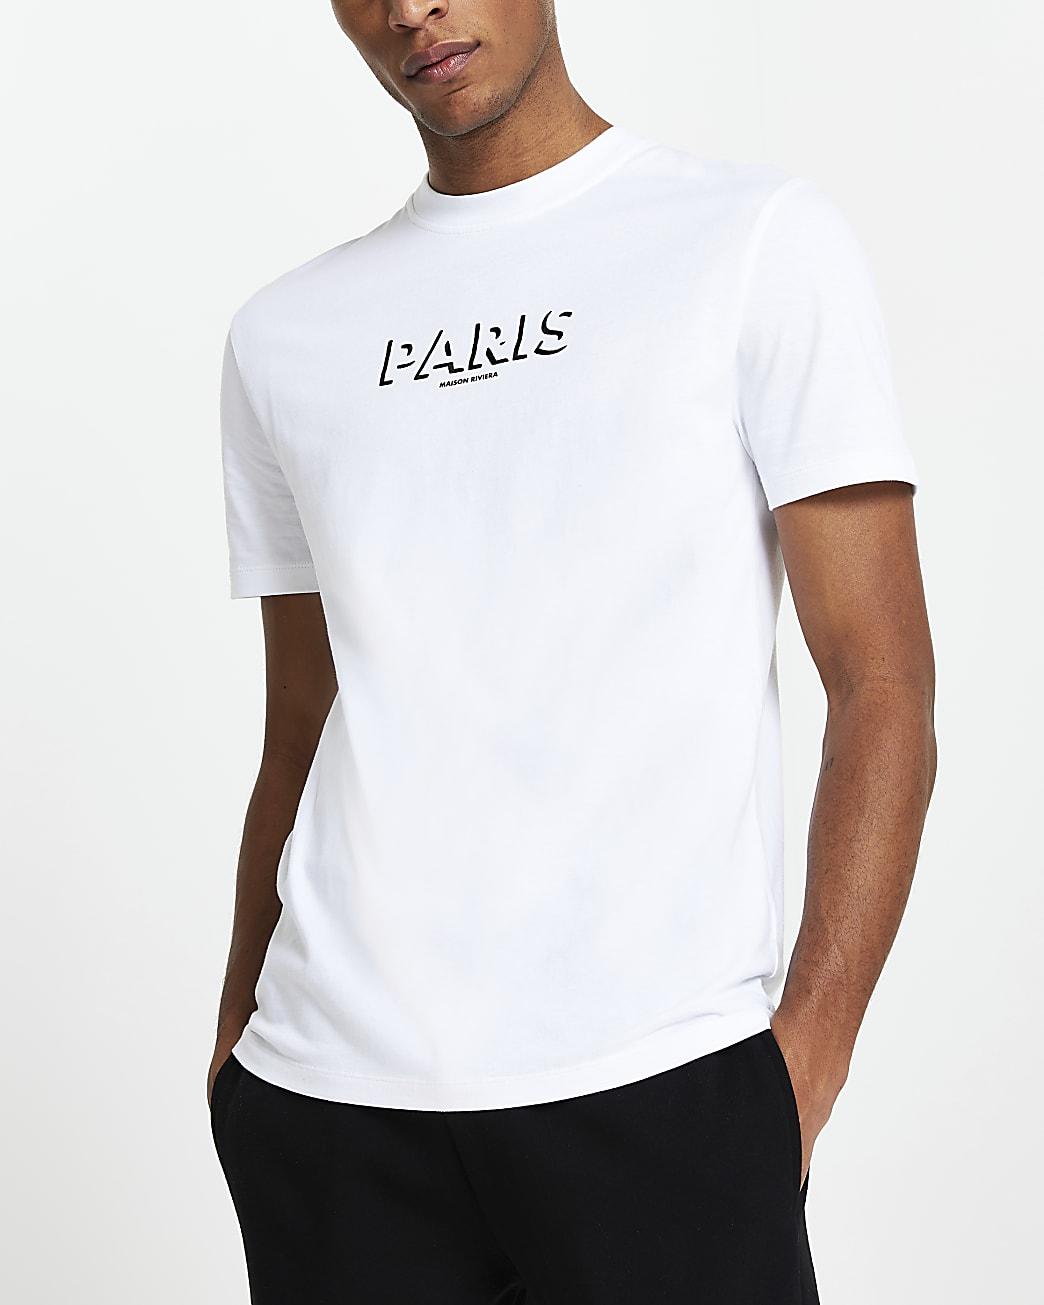 Maison Riviera white slim fit graphic t-shirt